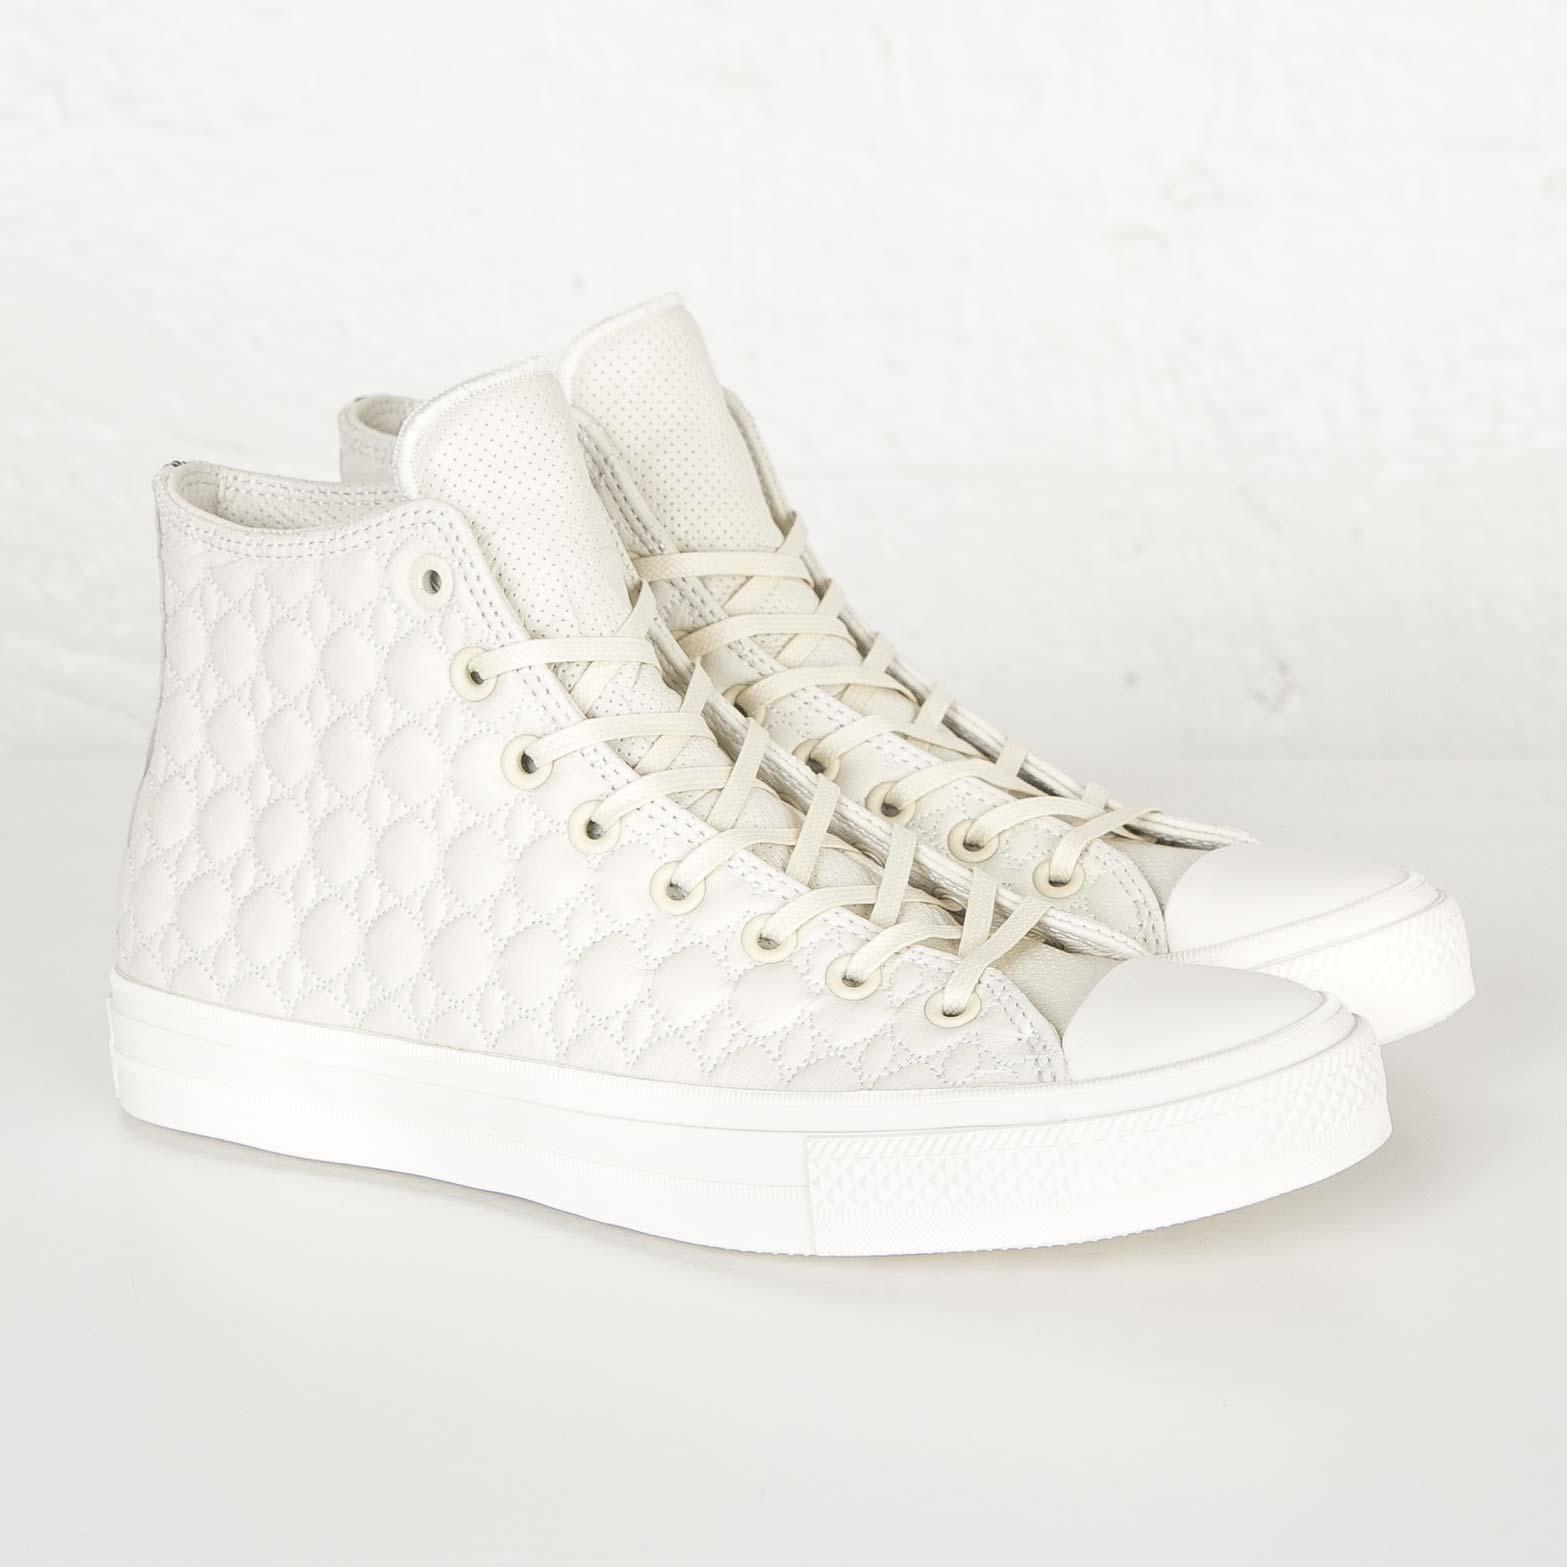 e48c005f32e6 Converse Chuck Taylor II Hi Leather - 152812c - Sneakersnstuff ...